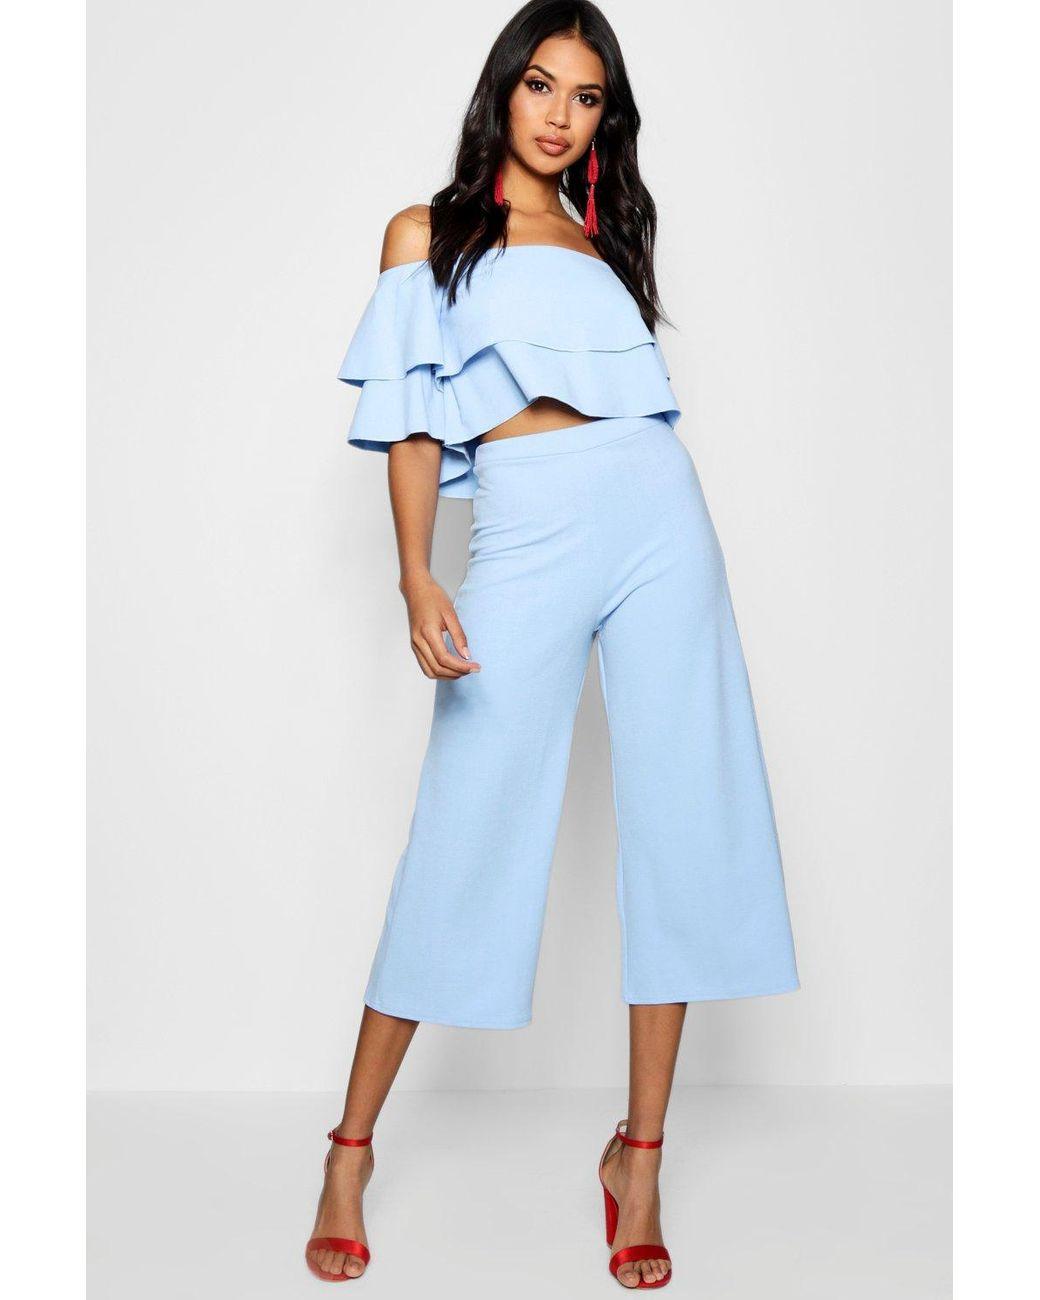 New Ladies Floral Print High Waist Neck Crop Top  A Line Skirt Dress Co Ord Set